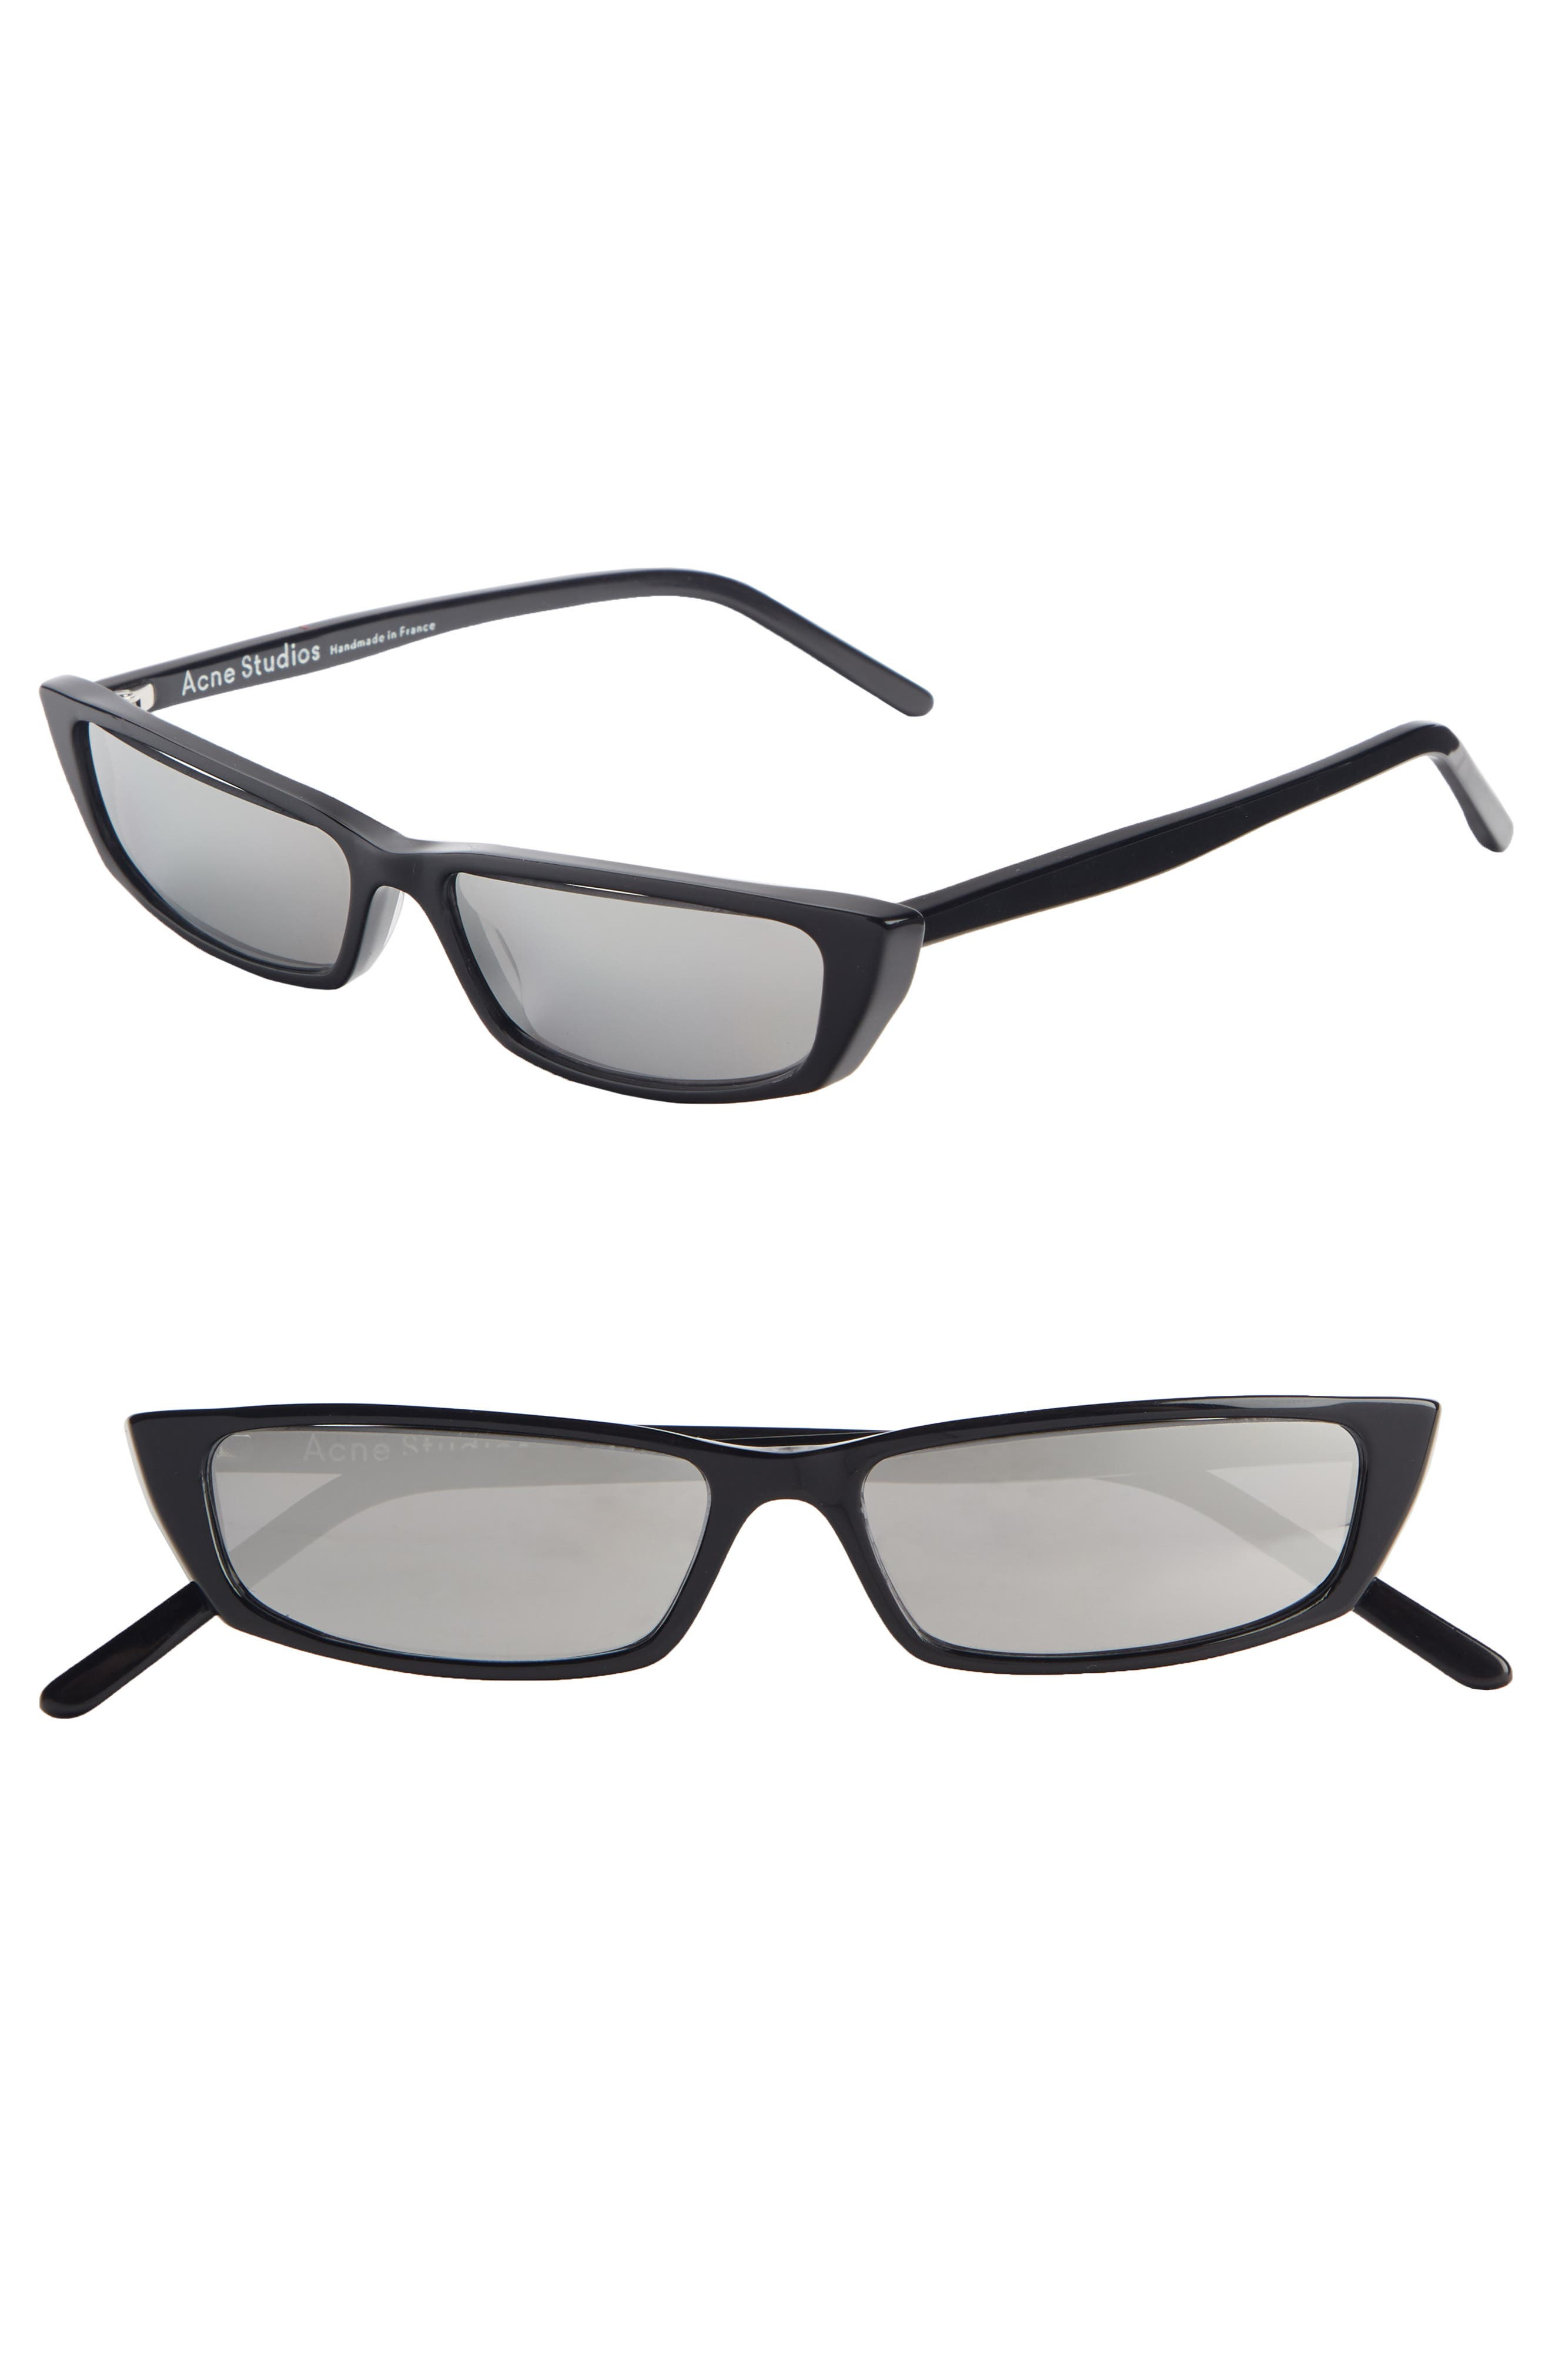 39d051ec5cd5 Acne Studios Sunglasses for Women